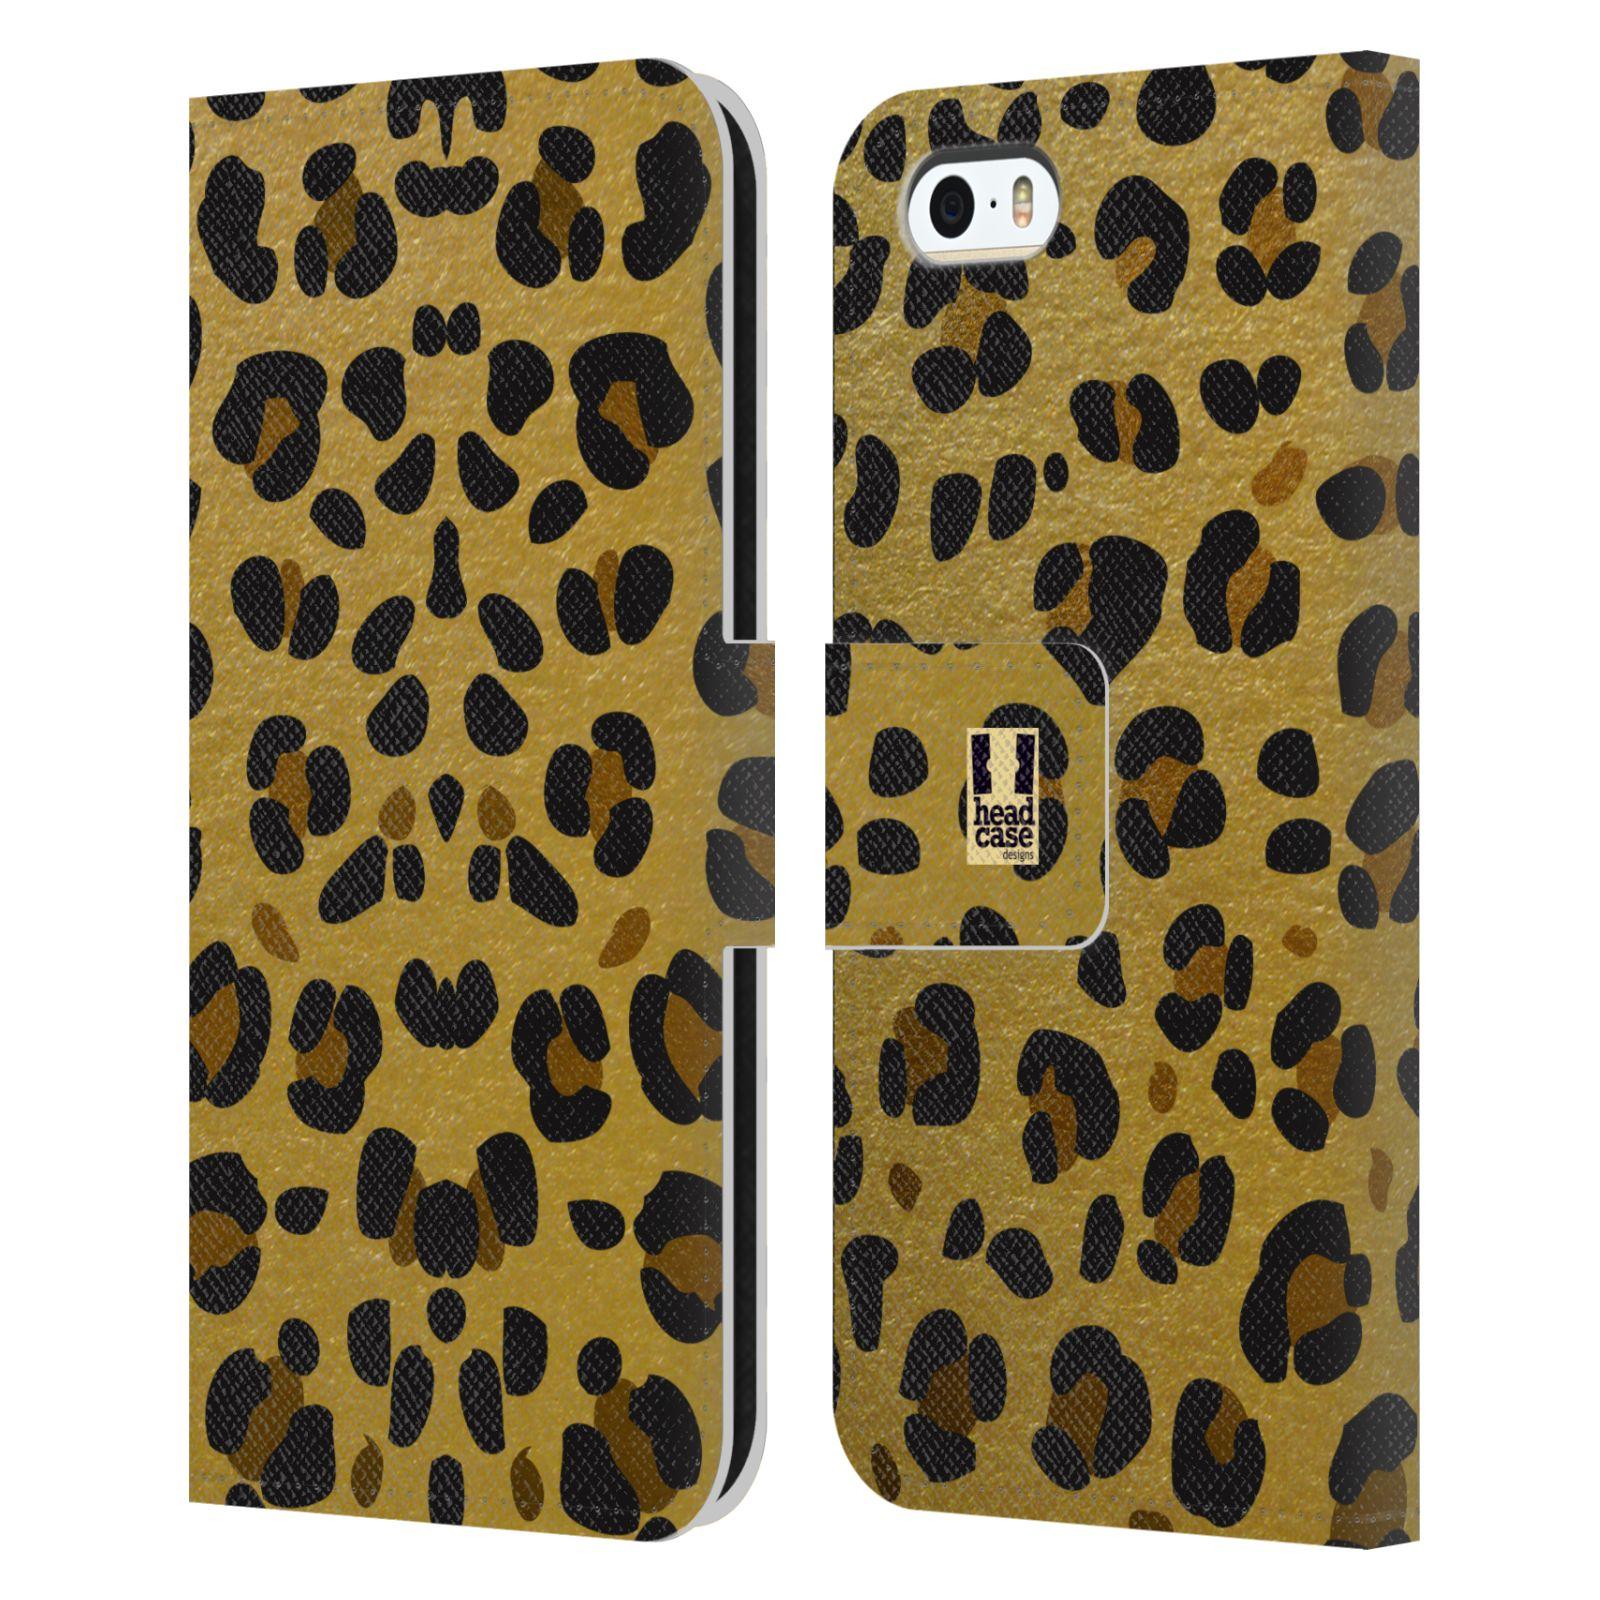 Pouzdro na mobil Apple Iphone 5 / 5S - Head Case - Fashion zvířecí vzor